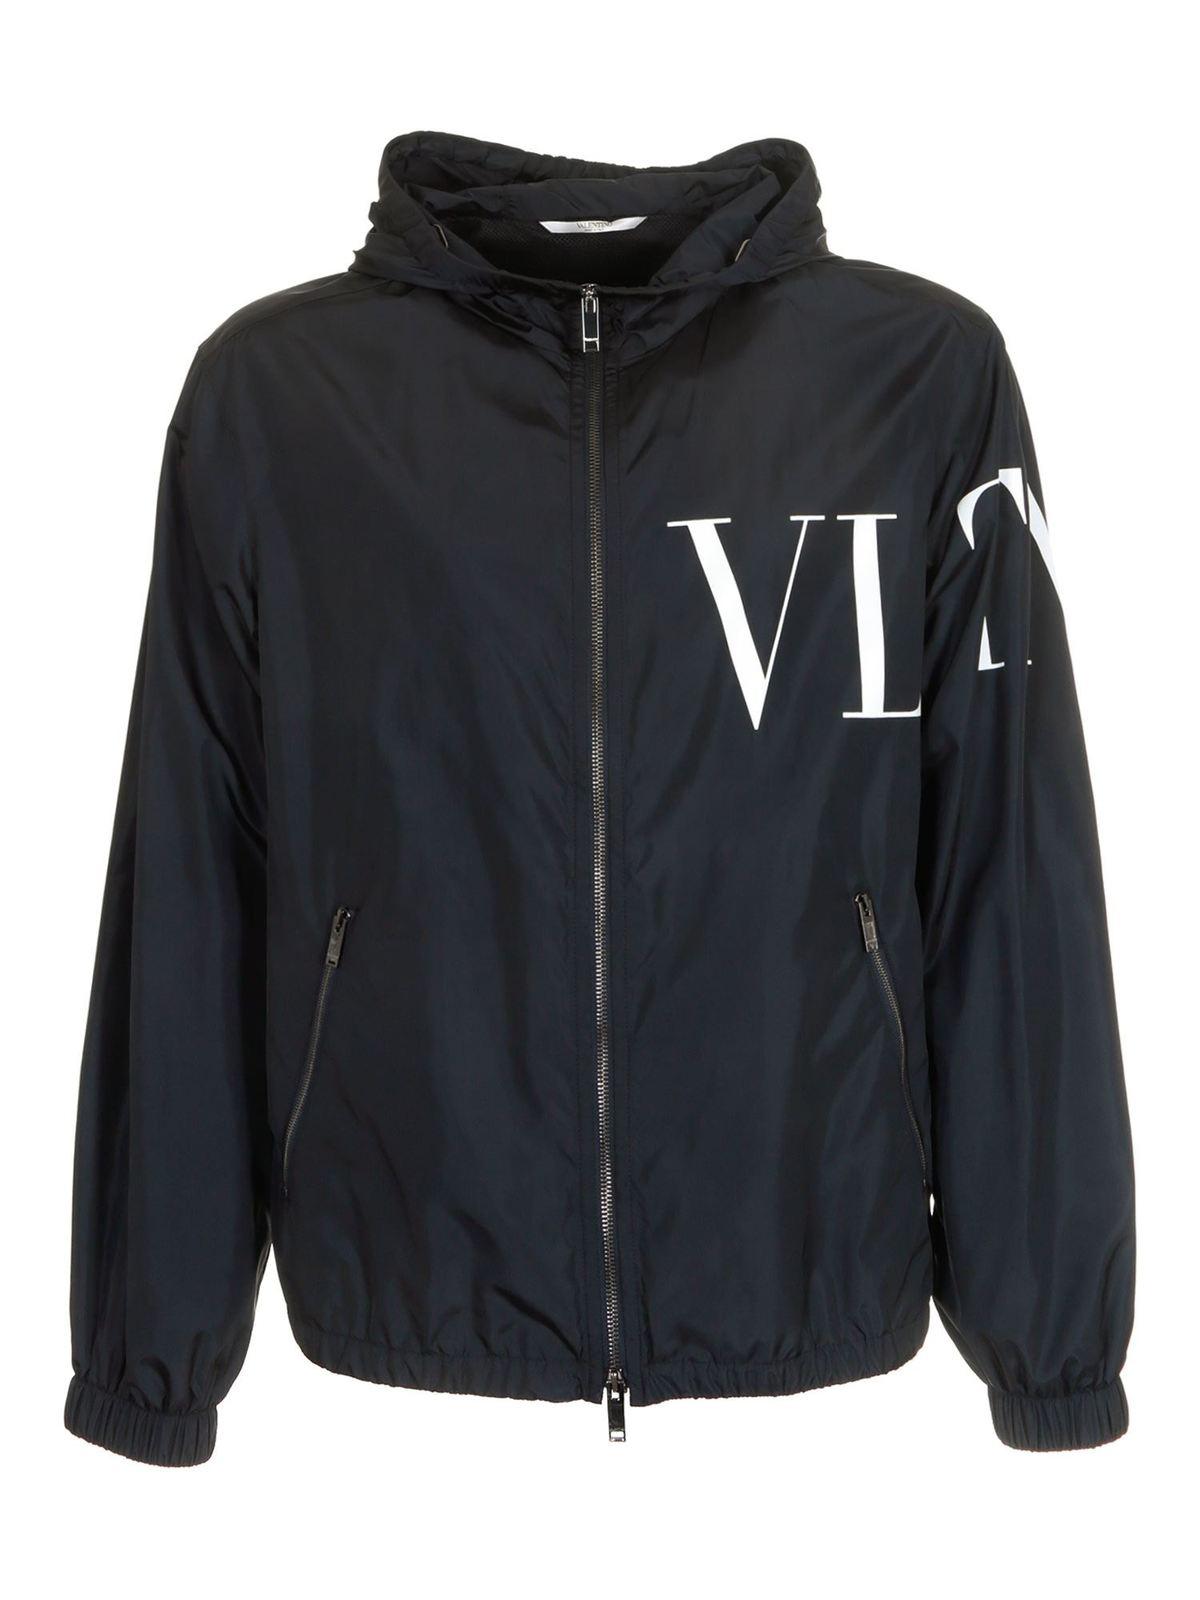 Valentino VLTN JACKET IN BLUE AND WHITE